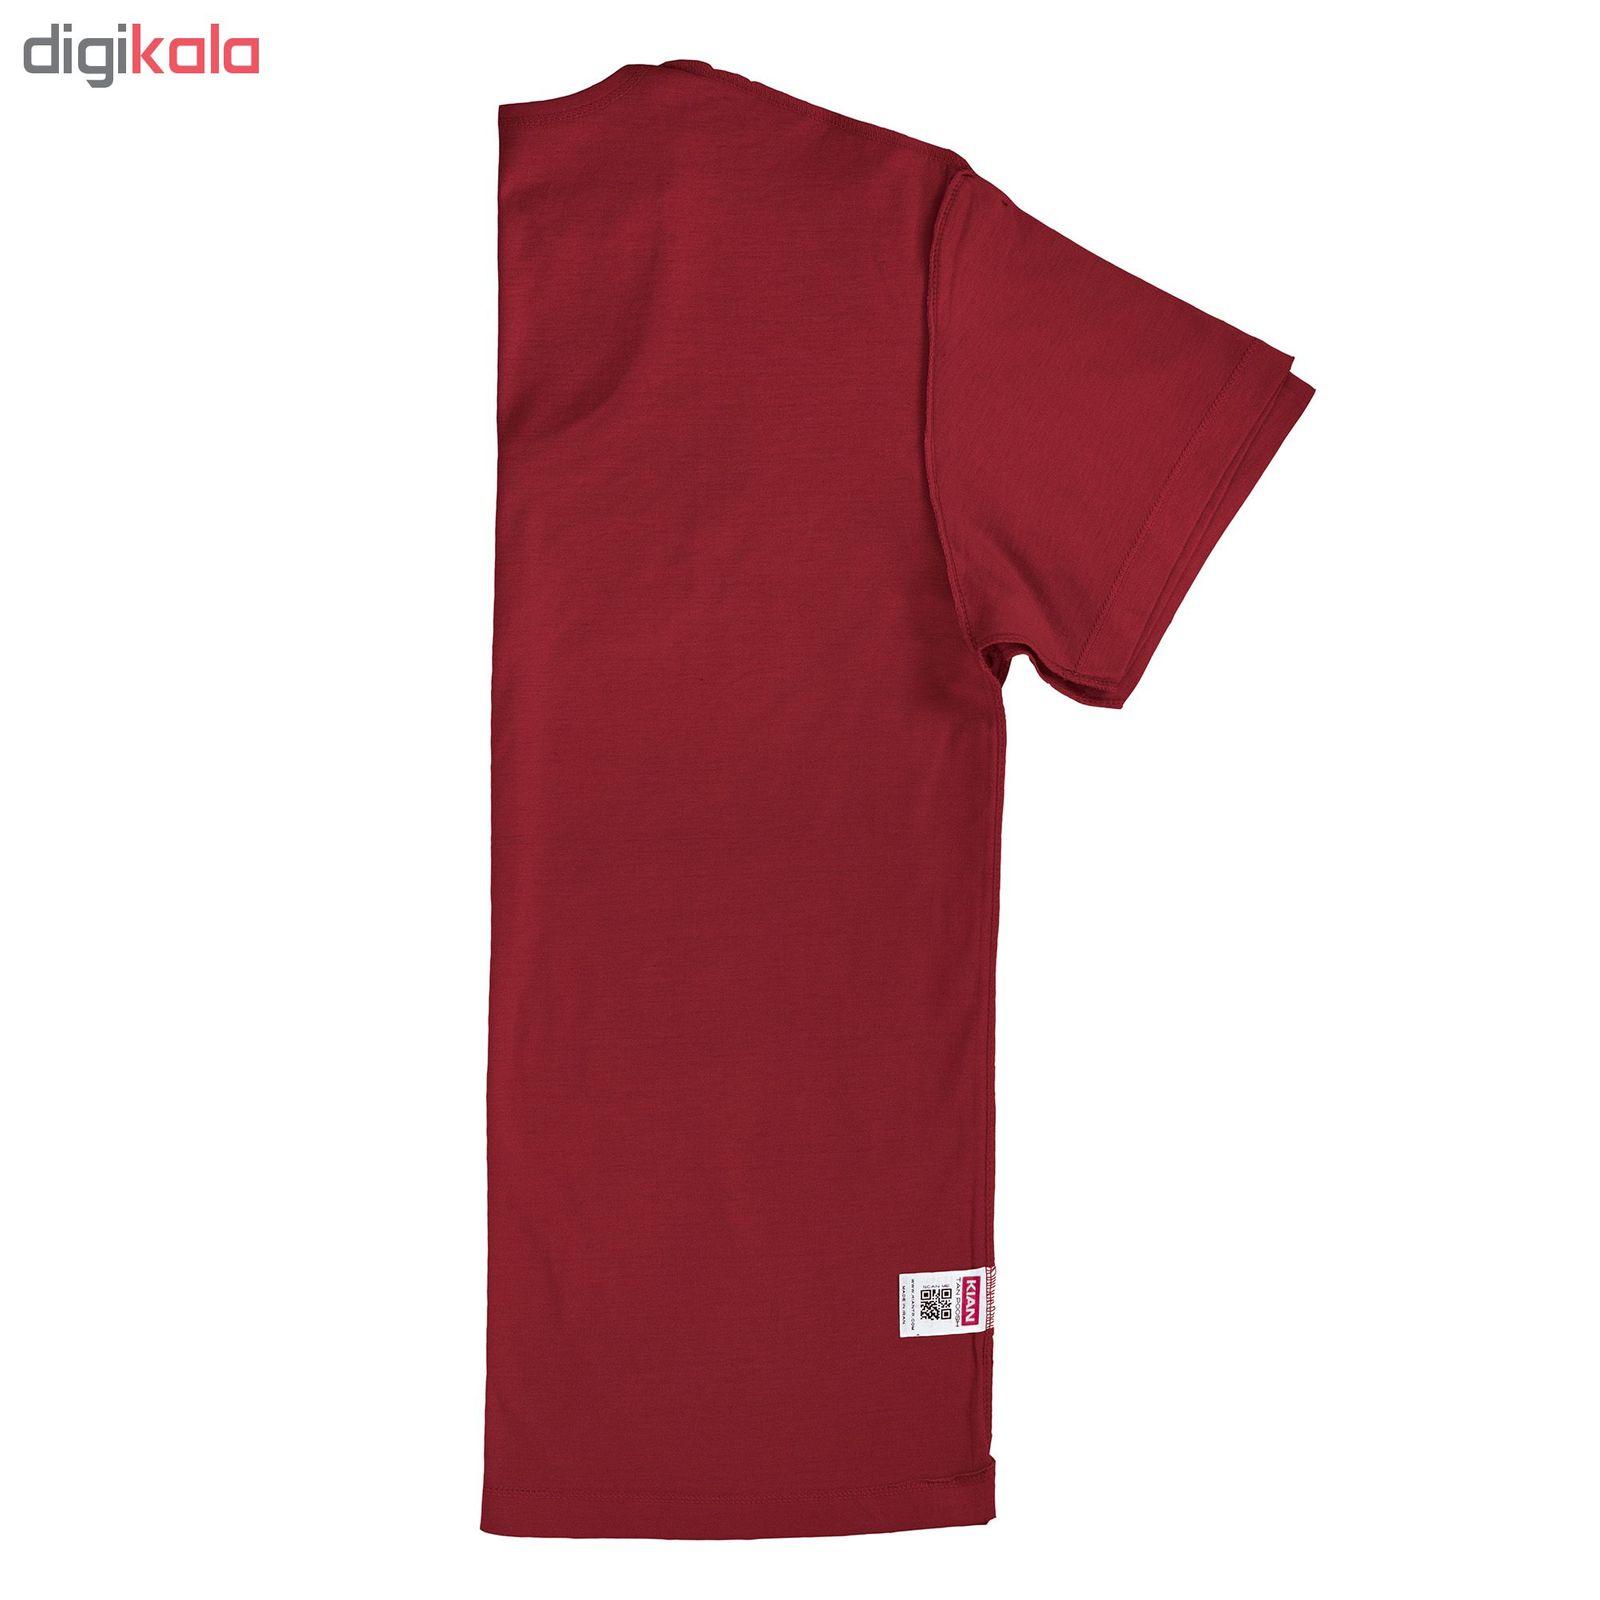 زیرپوش مردانه کیان تن پوش مدل U Neck Shirt Classic R main 1 2